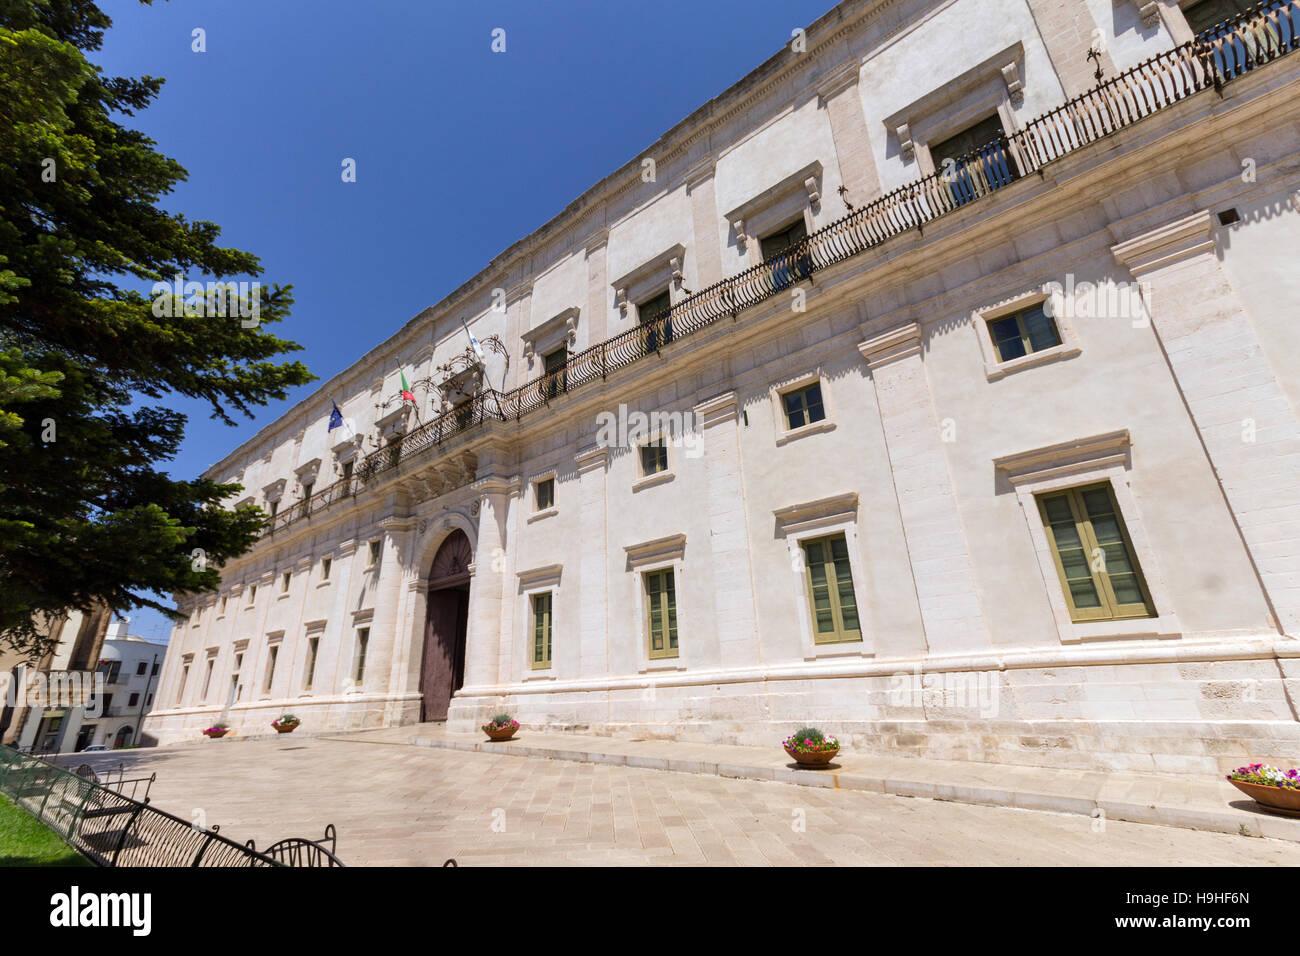 Italy, Apulia, Martina Franca, Ducal Palace - Stock Image